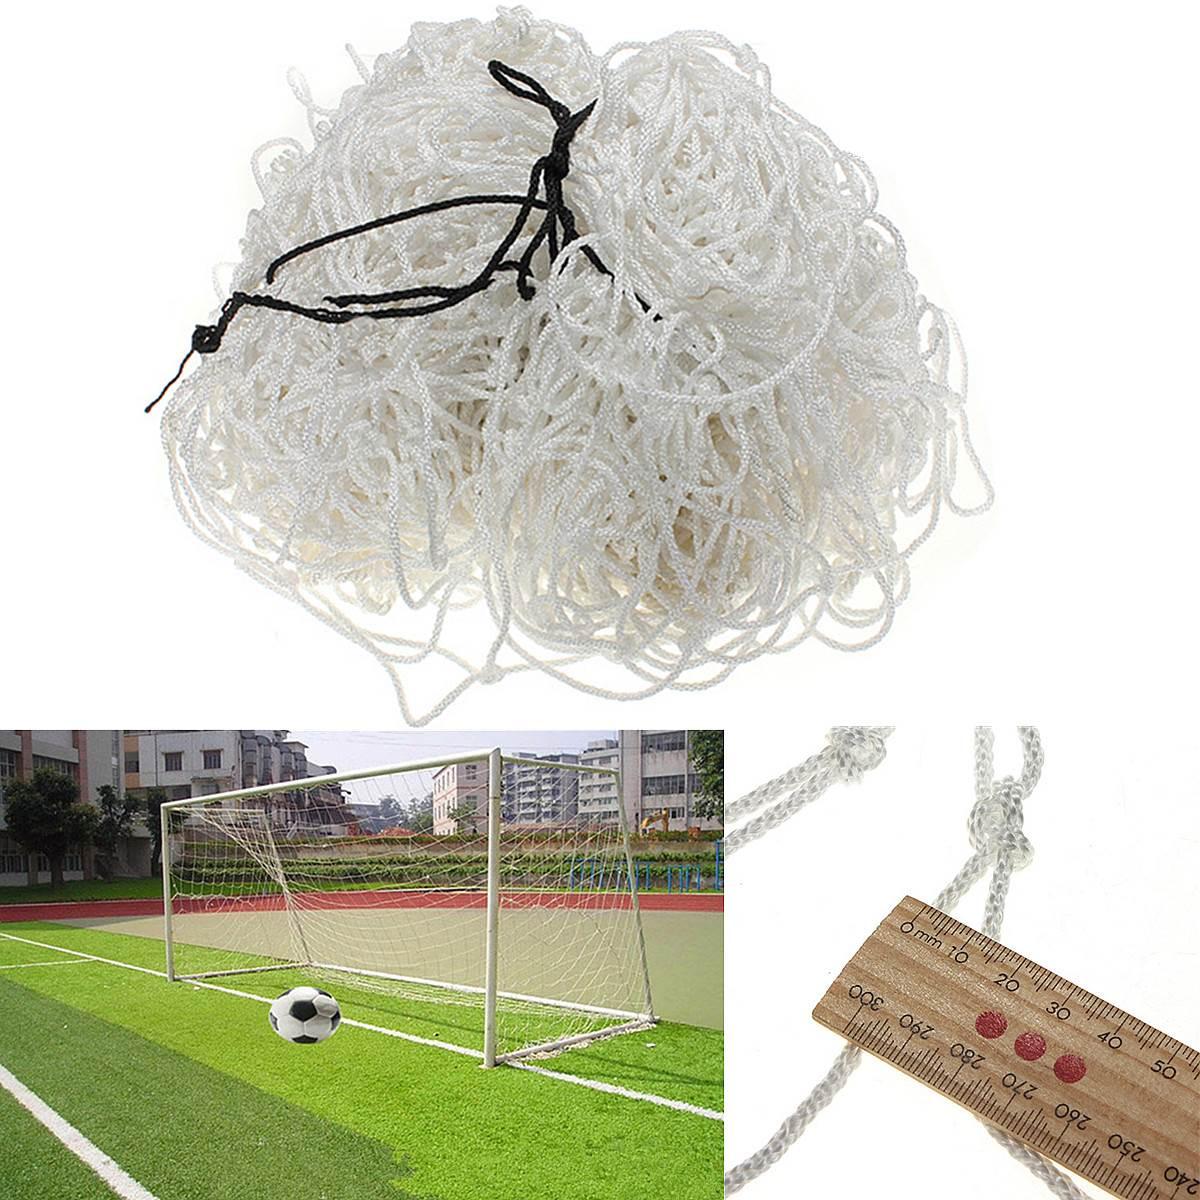 New Full Size 12x6ft 3.6x1.8m Football Soccer Goal Post Net Straight Flat Back Polypropylene Fiber(China (Mainland))